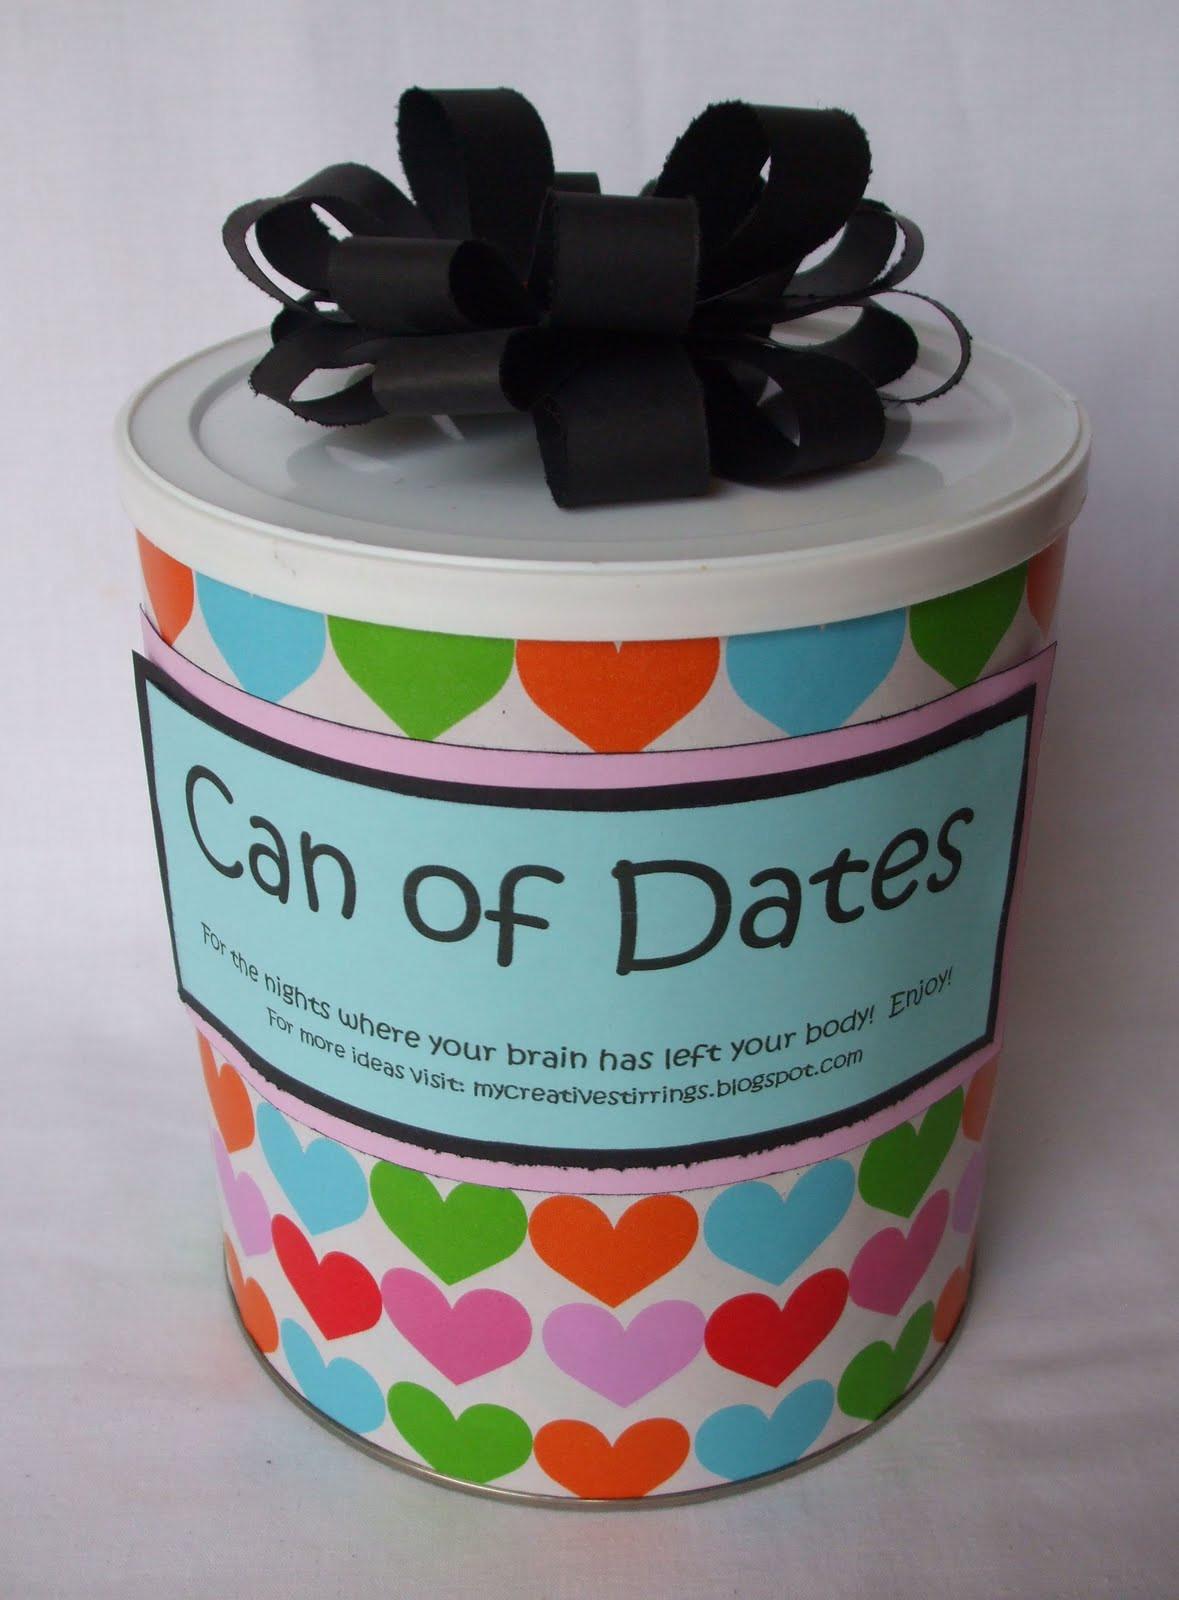 Creative Wedding Gift Ideas  My Creative Stirrings Creative Wedding Gift Idea Can of